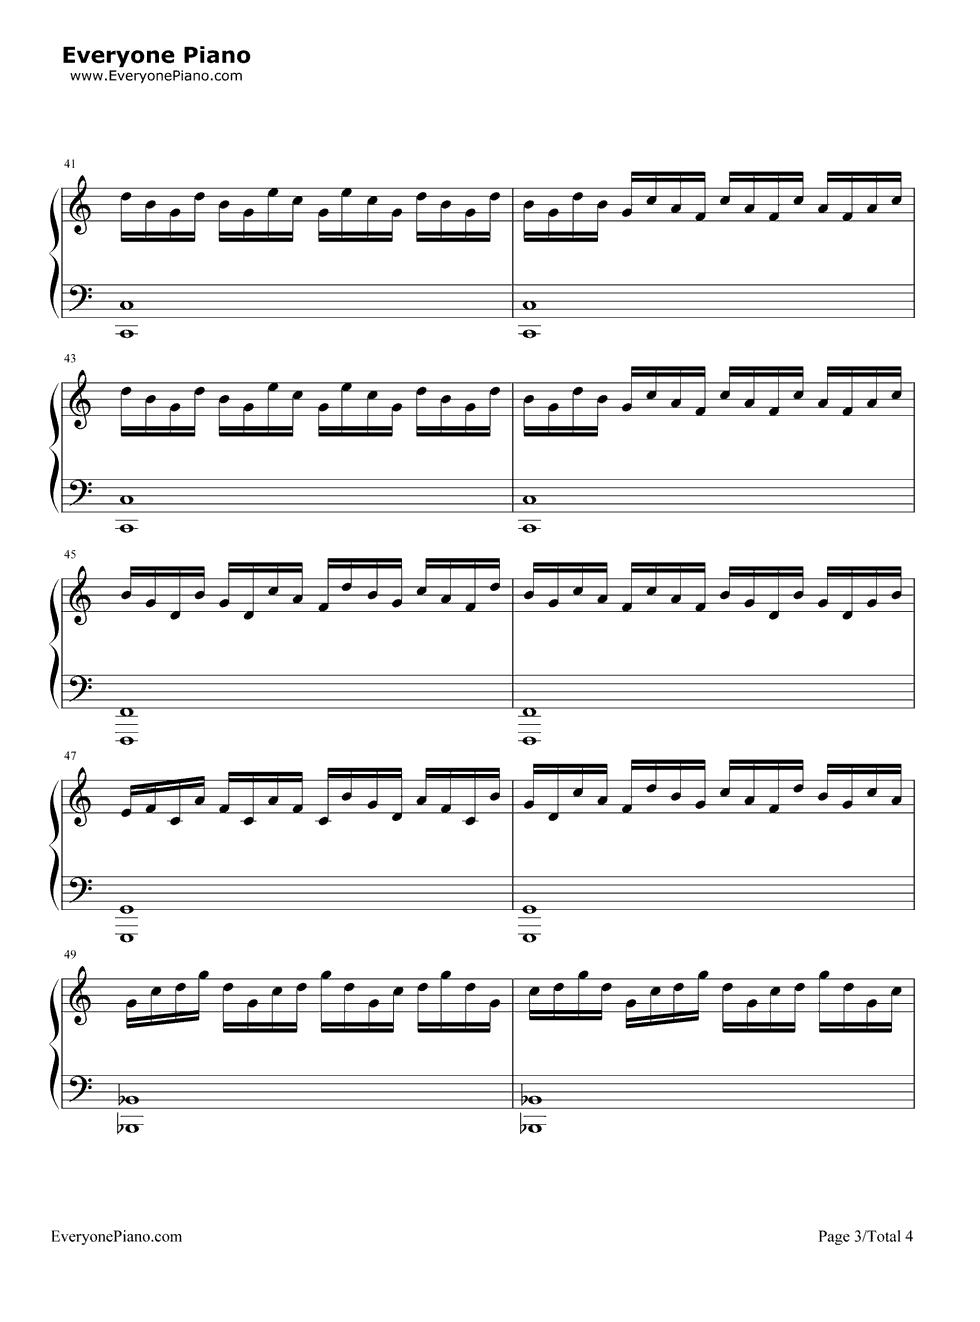 Jump van halen stave preview 3 free piano sheet music piano chords listen now print sheet jump van halen stave preview 3 hexwebz Choice Image